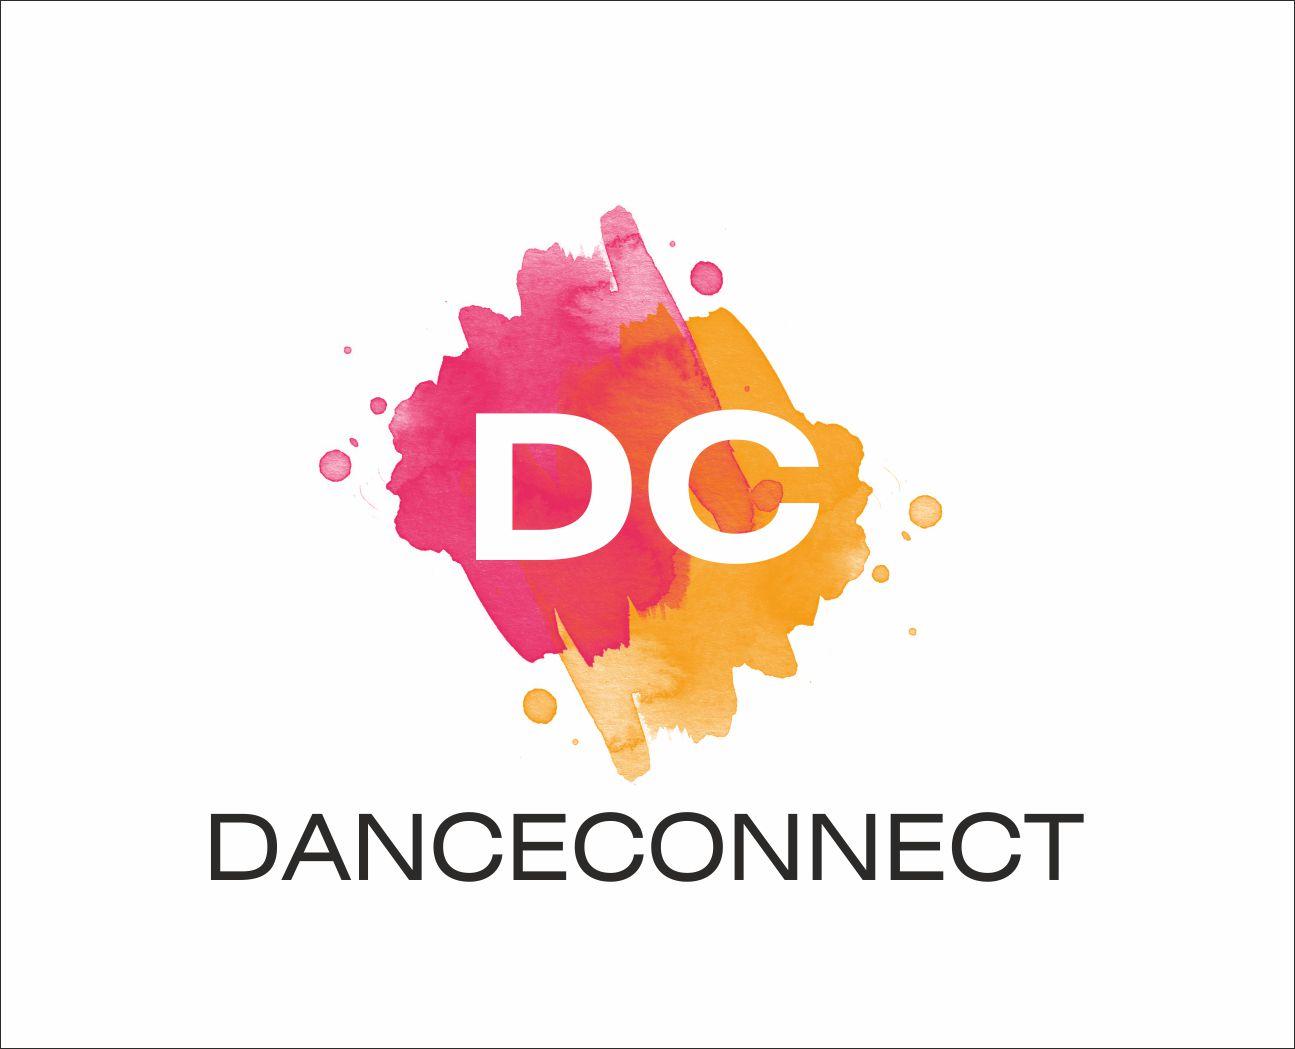 Разработка лого для спортивного портала www.danceconnect.ru фото f_0605b44d16d643ca.jpg